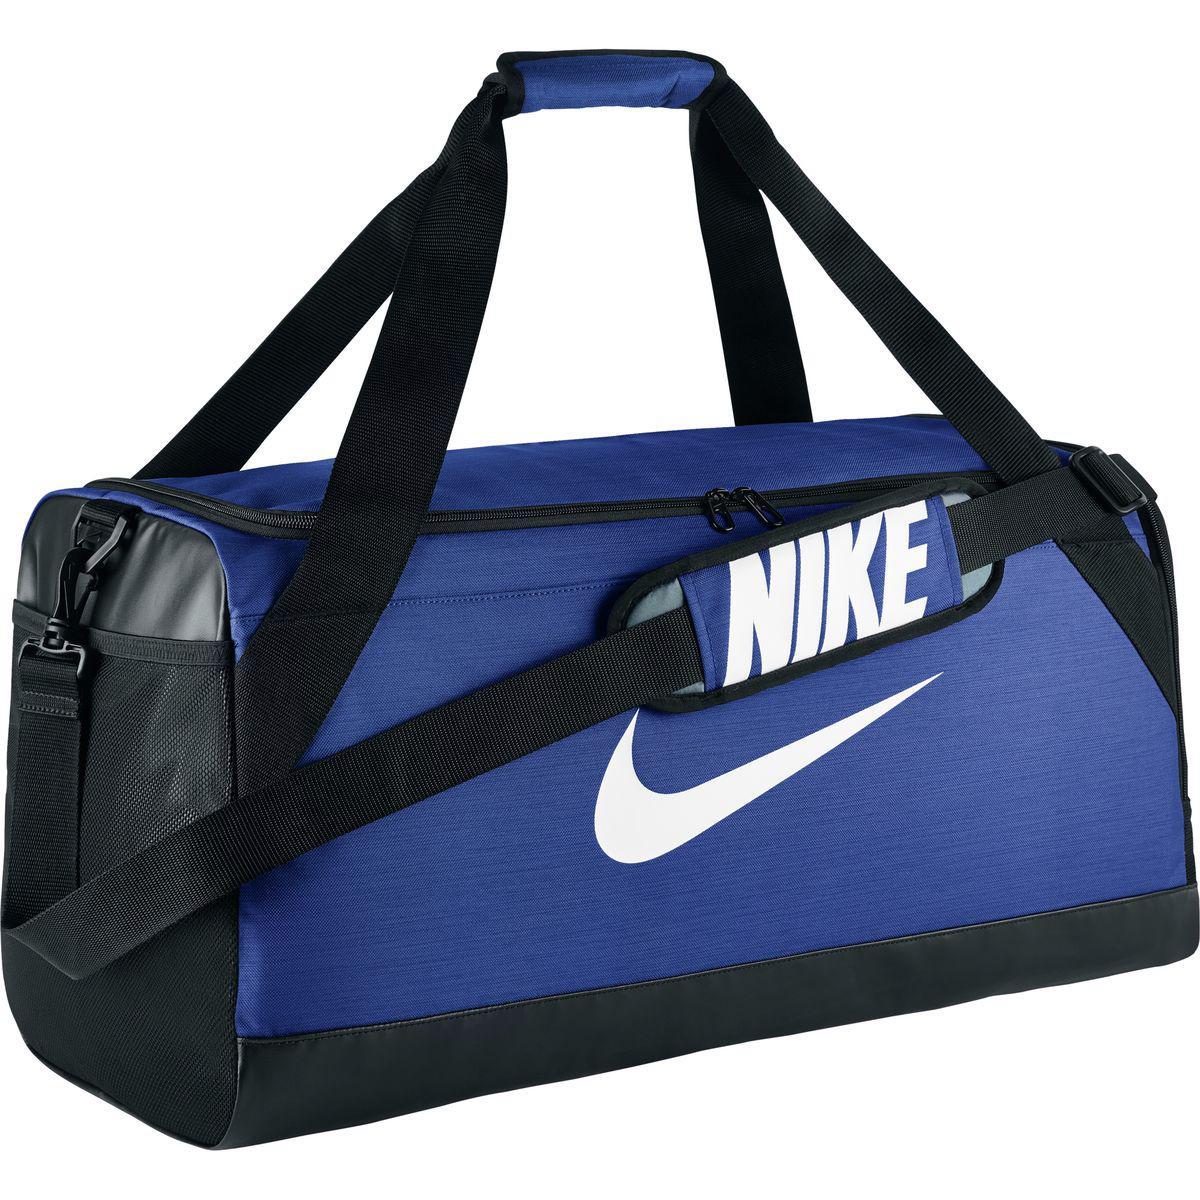 1e98c5120a Lyst - Nike Brasilia Medium Duffel Bag (game Royal black white ...